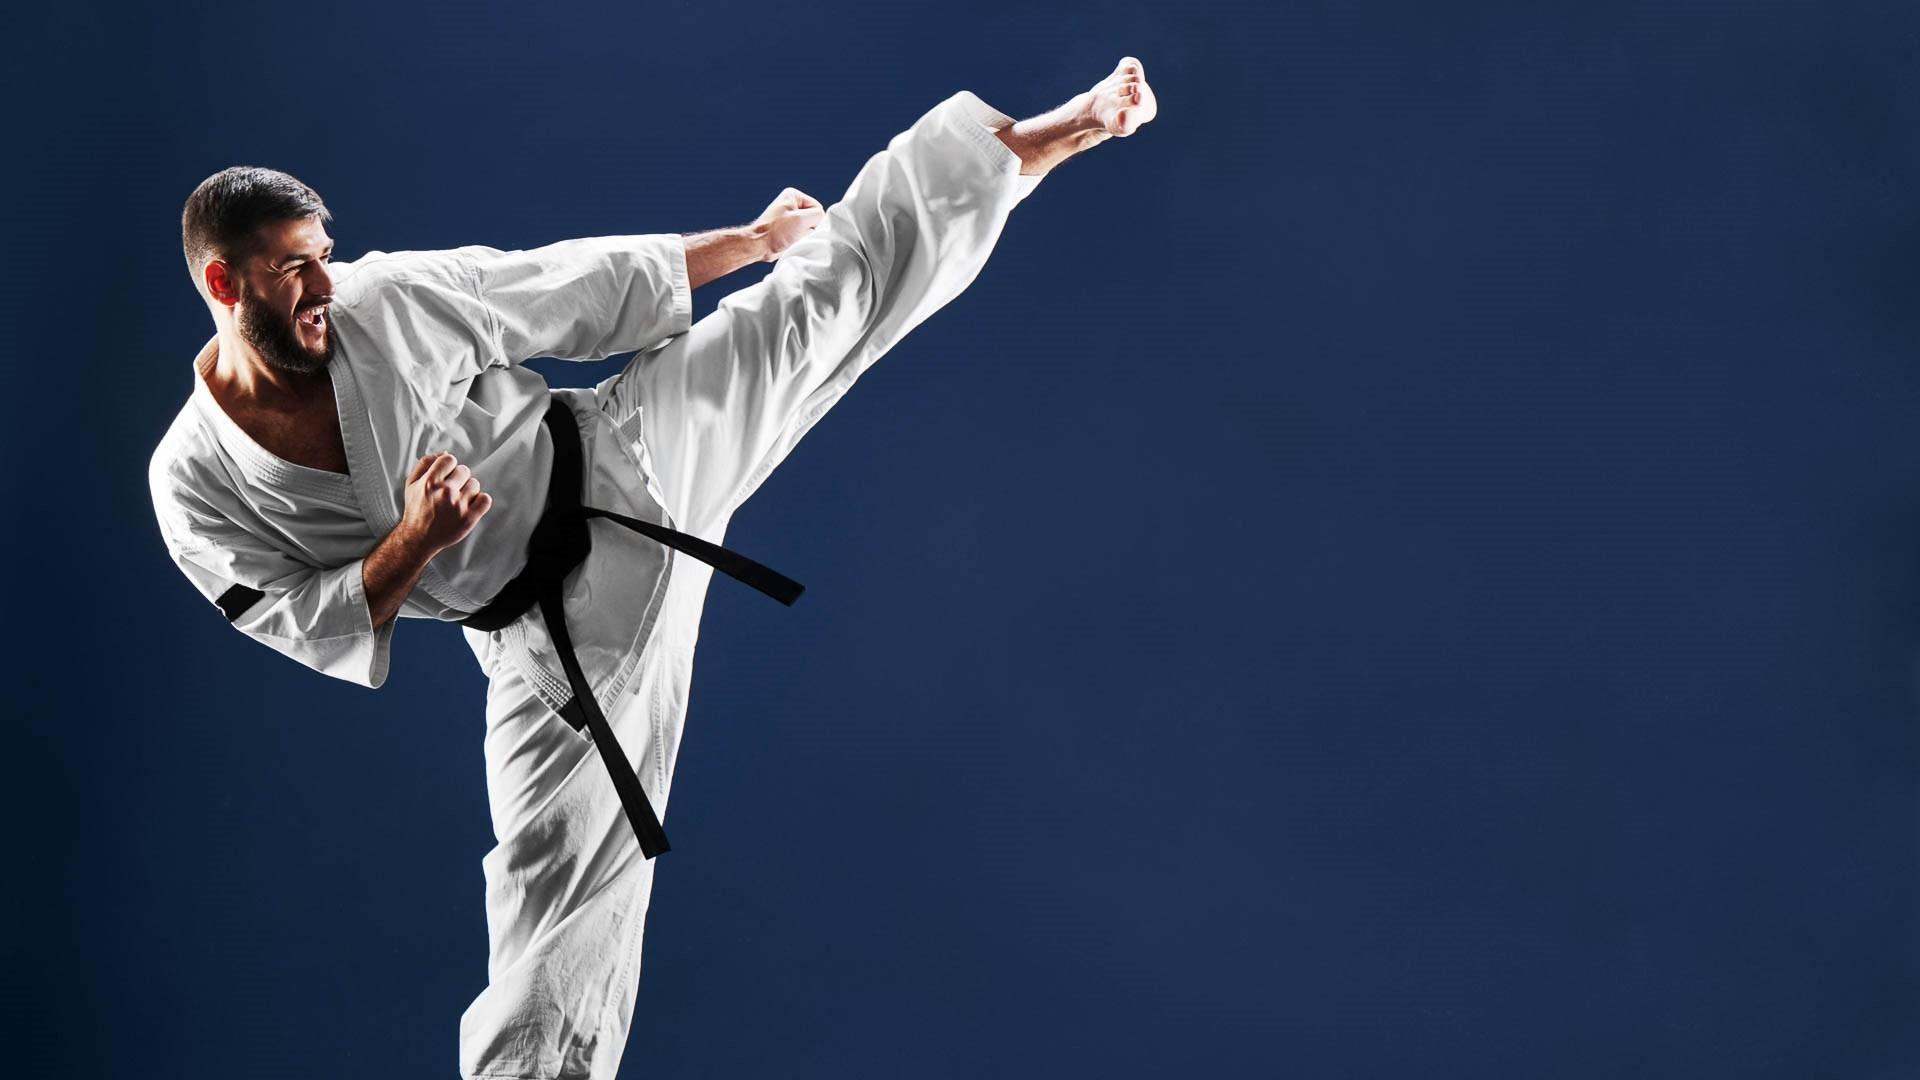 Karate Cool HD Wallpaper